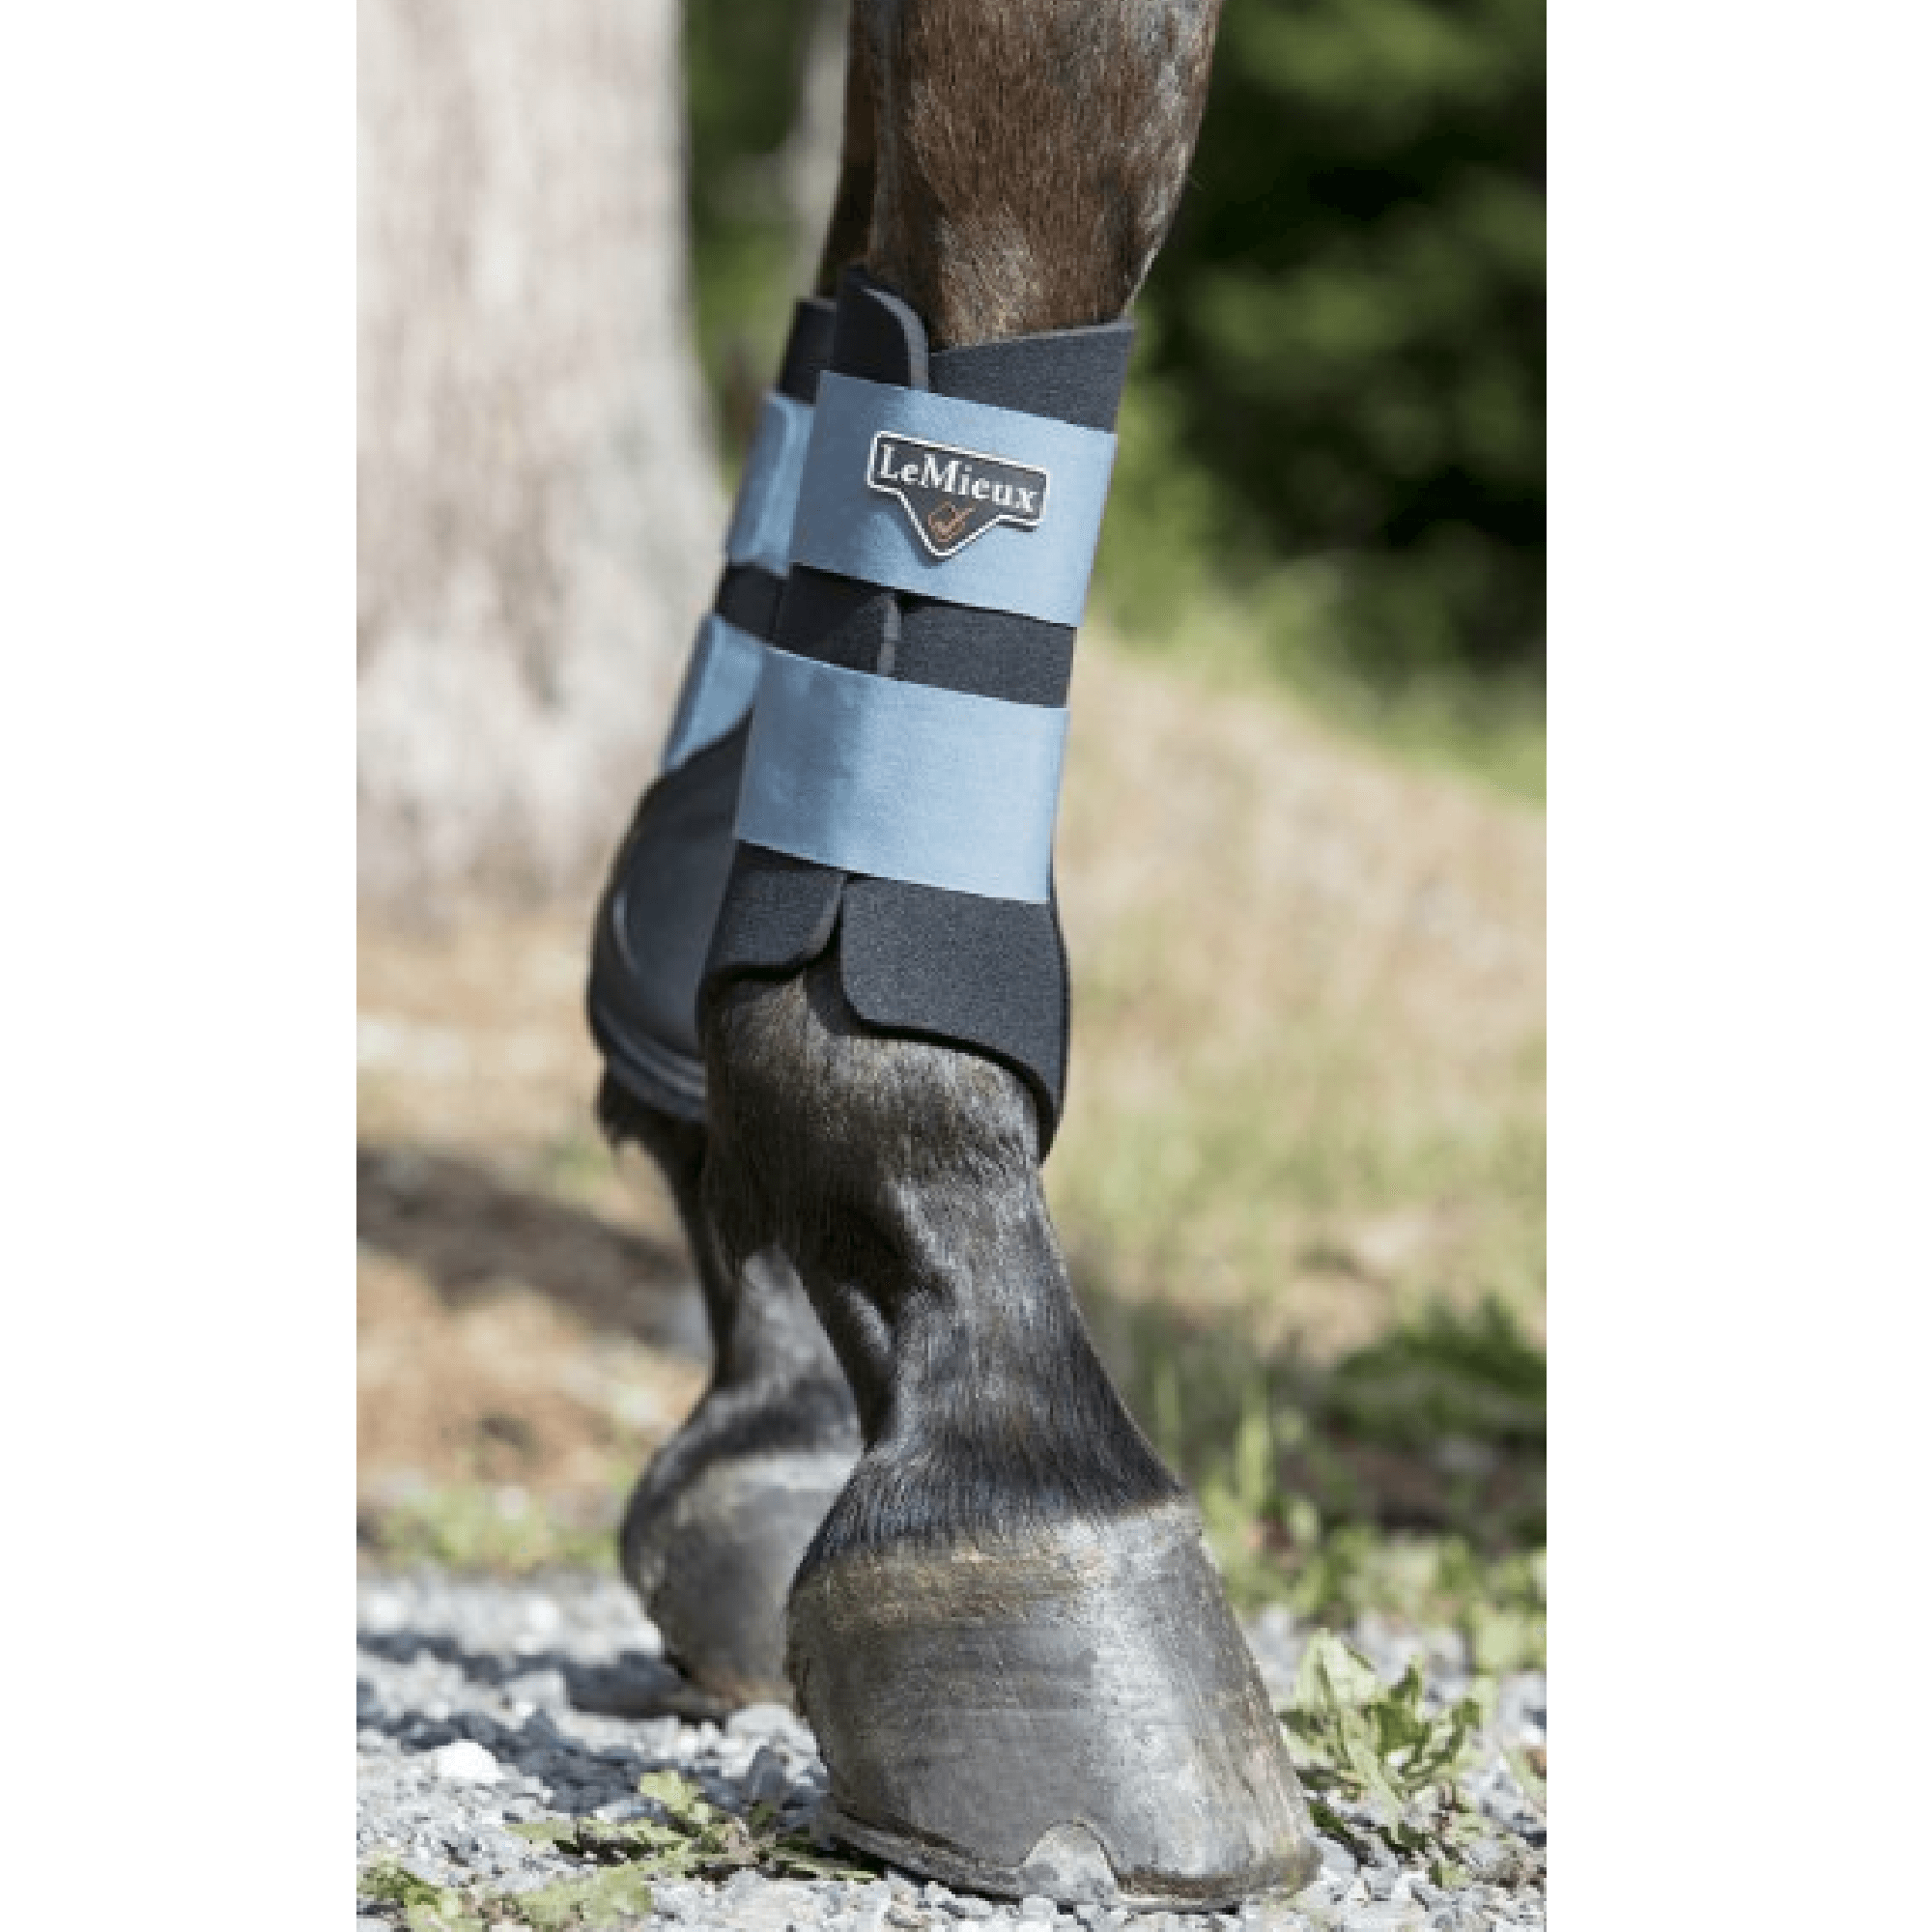 LeMieux-ProSport-Grafter-Brushing-Boots-Dressage-Schooling-Turnout-Boots thumbnail 23